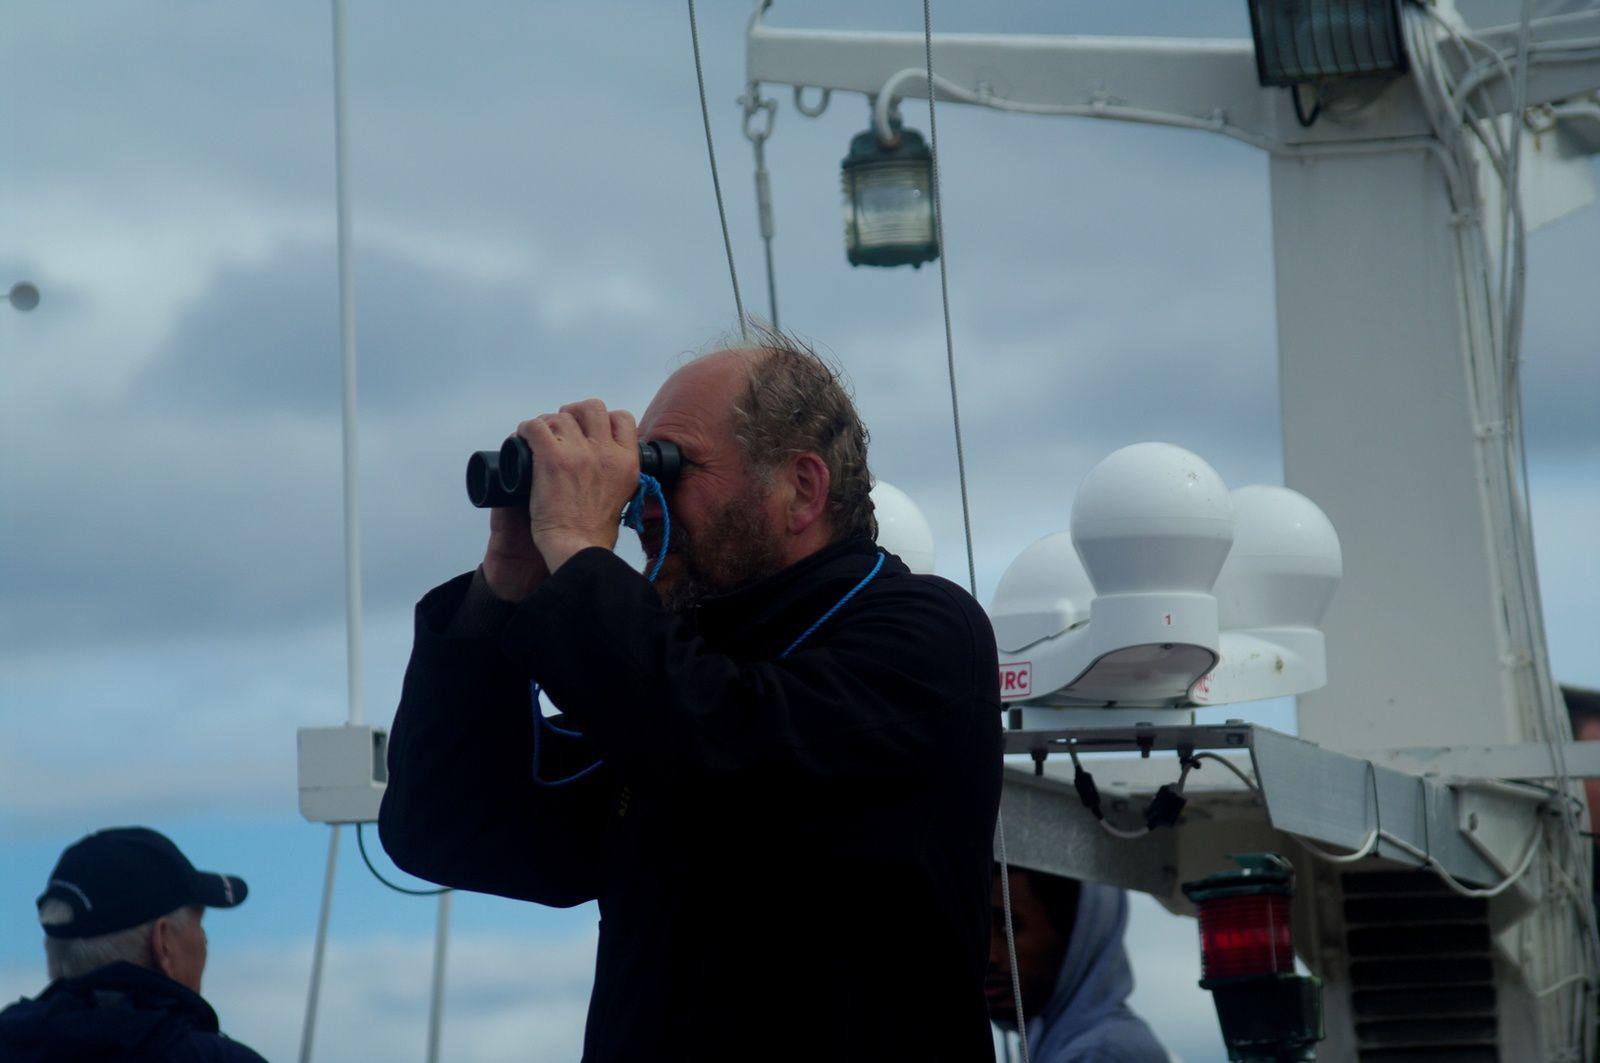 notre guide scrute la mer....baleine baleine où es-tu ???